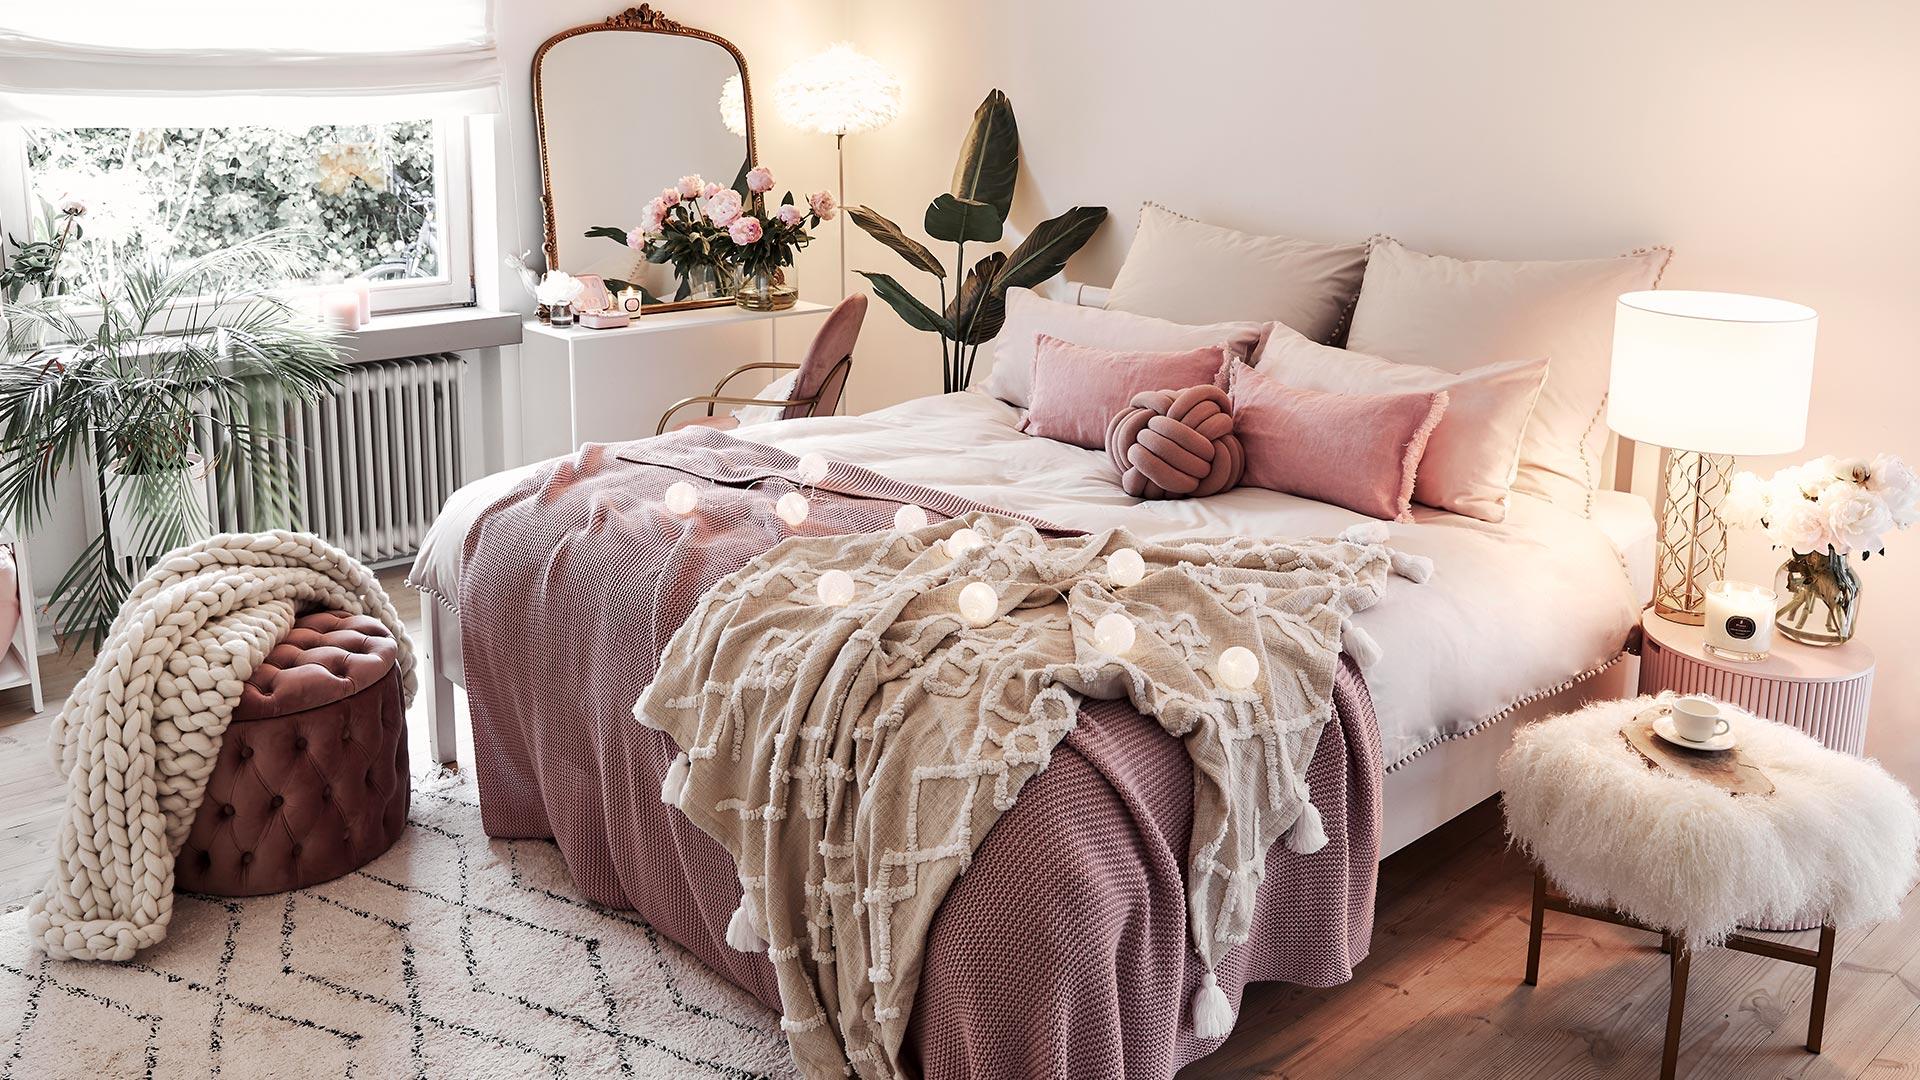 Cozy feminine